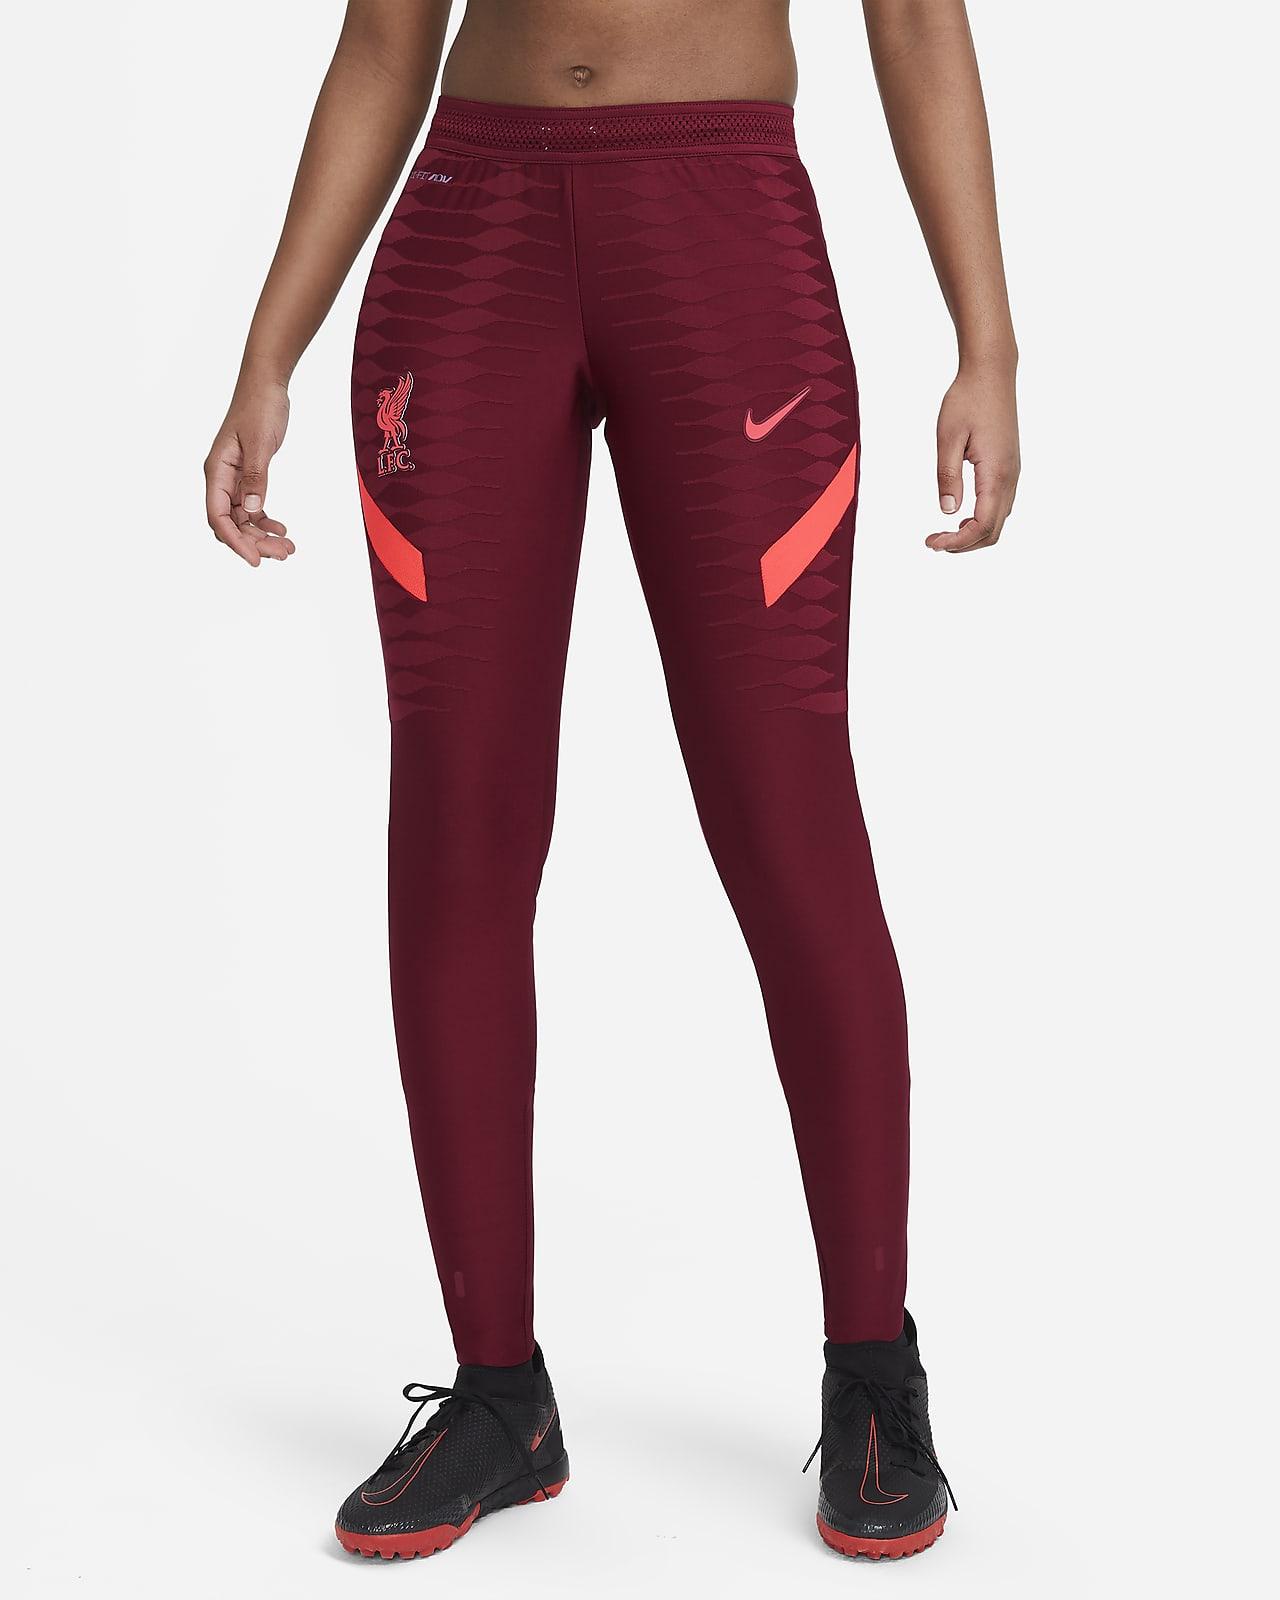 Liverpool FC Elite Nike Dri-FIT ADV Fußballhose für Damen